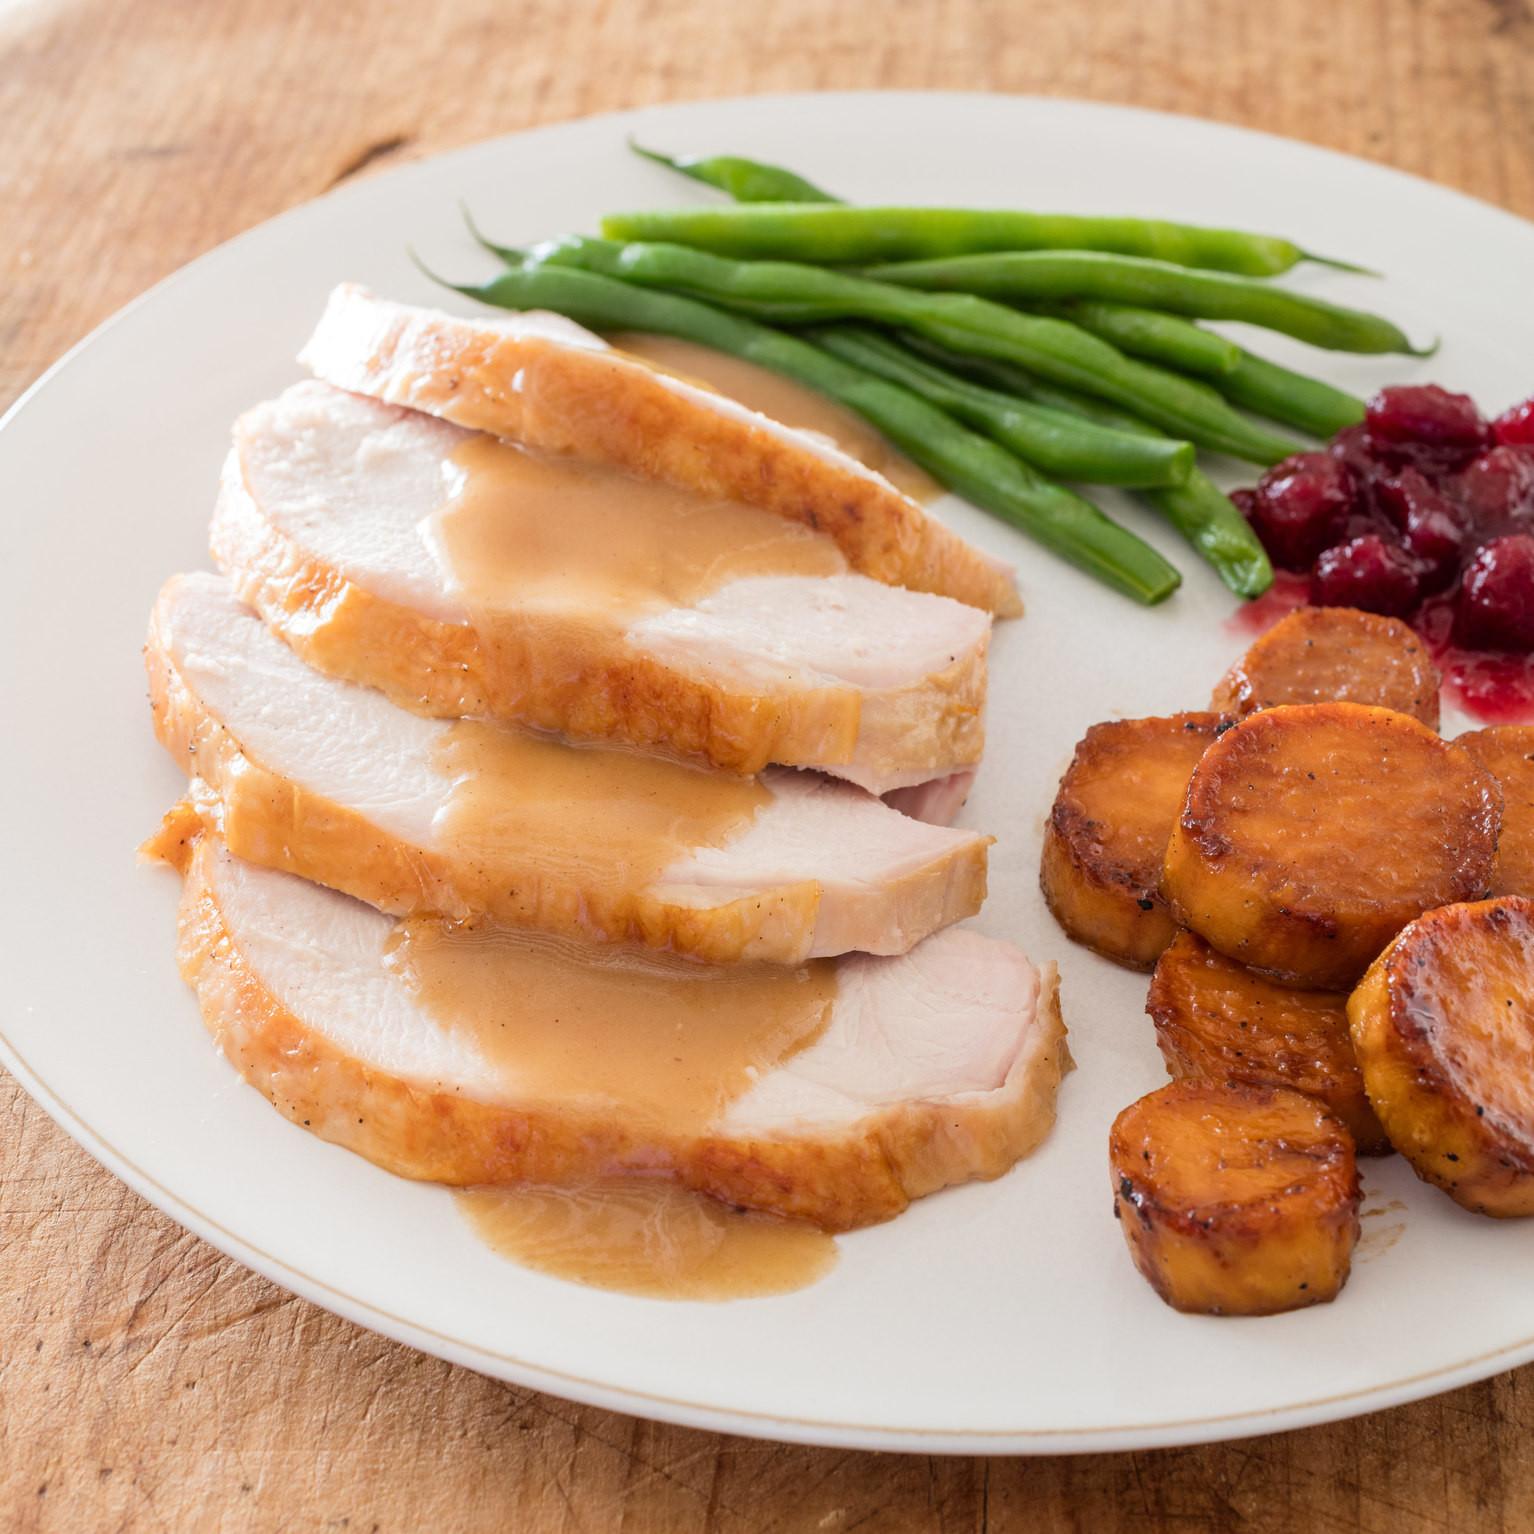 American Test Kitchen Thanksgiving Turkey  Slow Roasted Turkey with Gravy